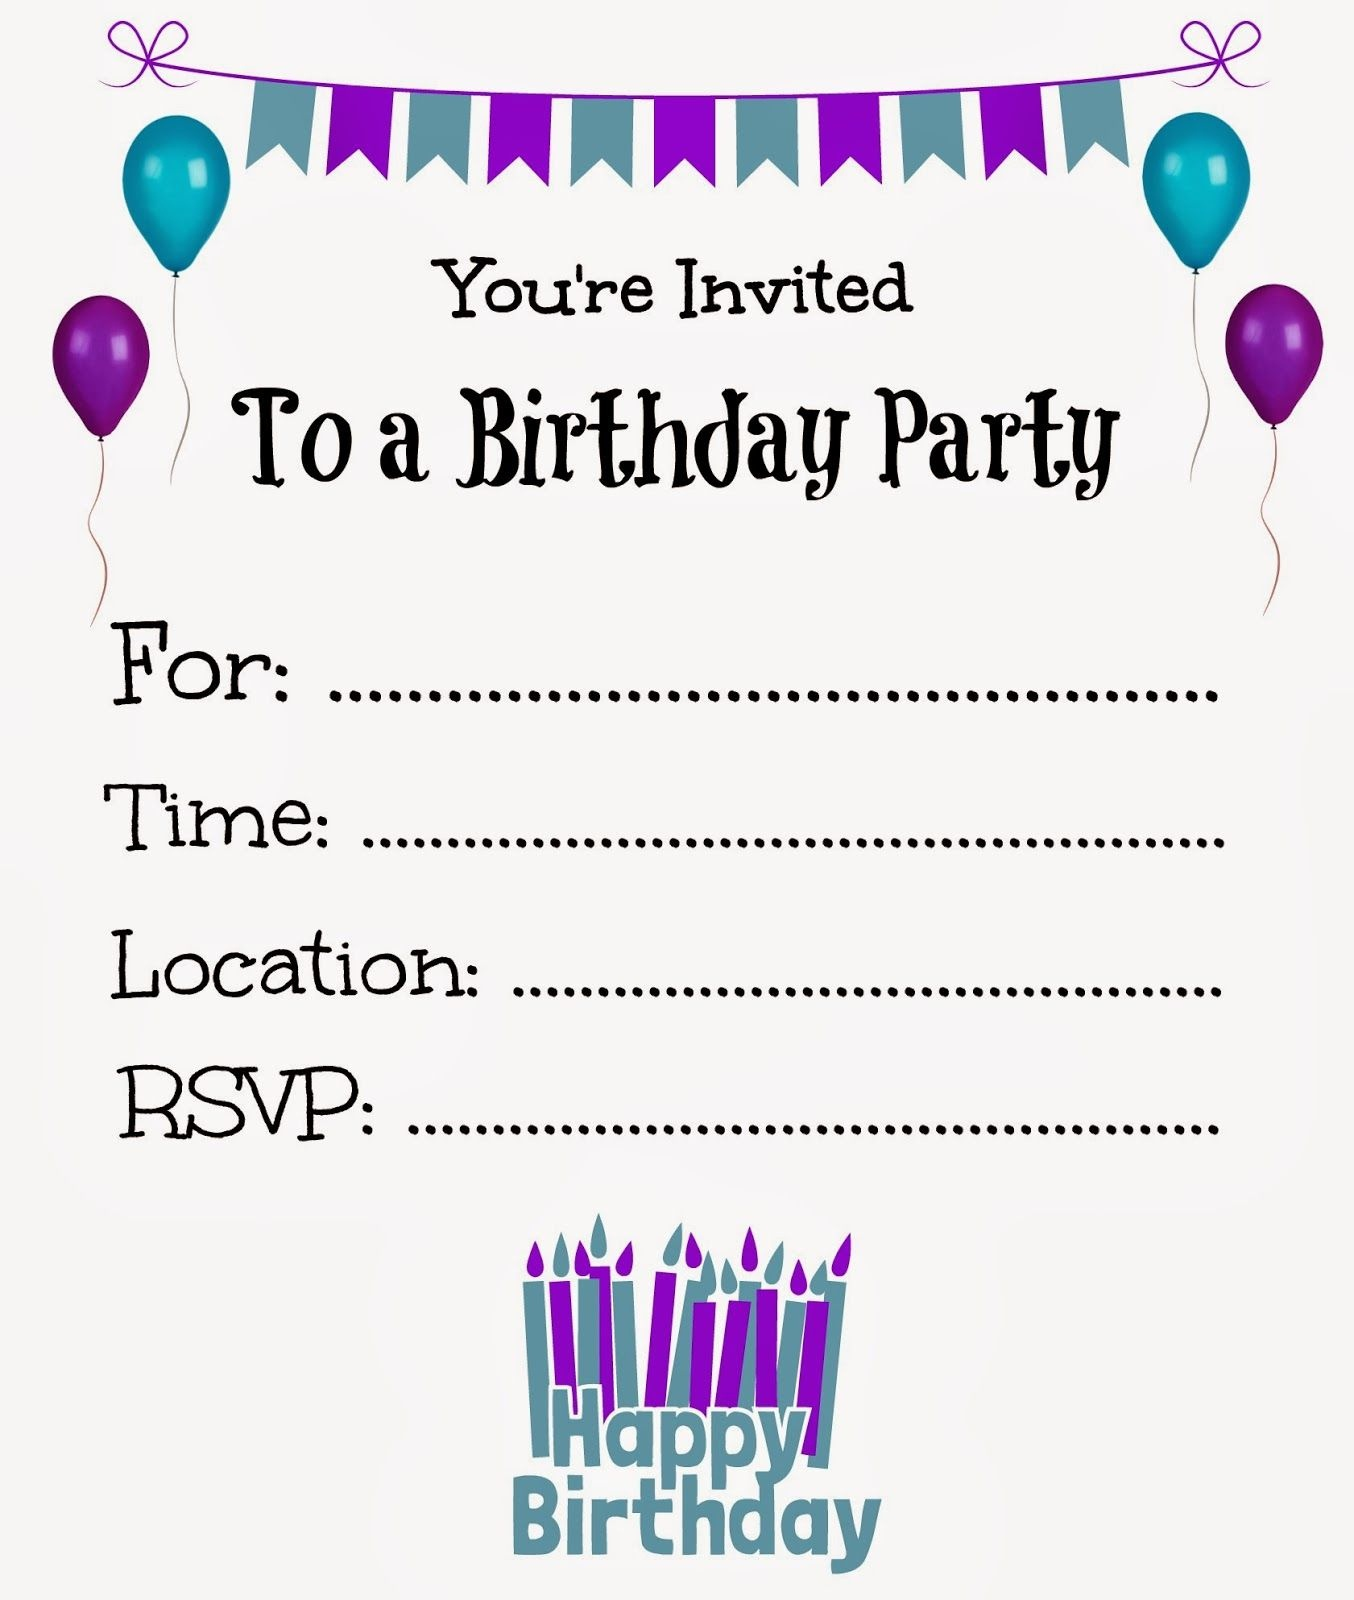 Free Printable Birthday Invitations For Kids #freeprintables - Make Your Own Birthday Party Invitations Free Printable